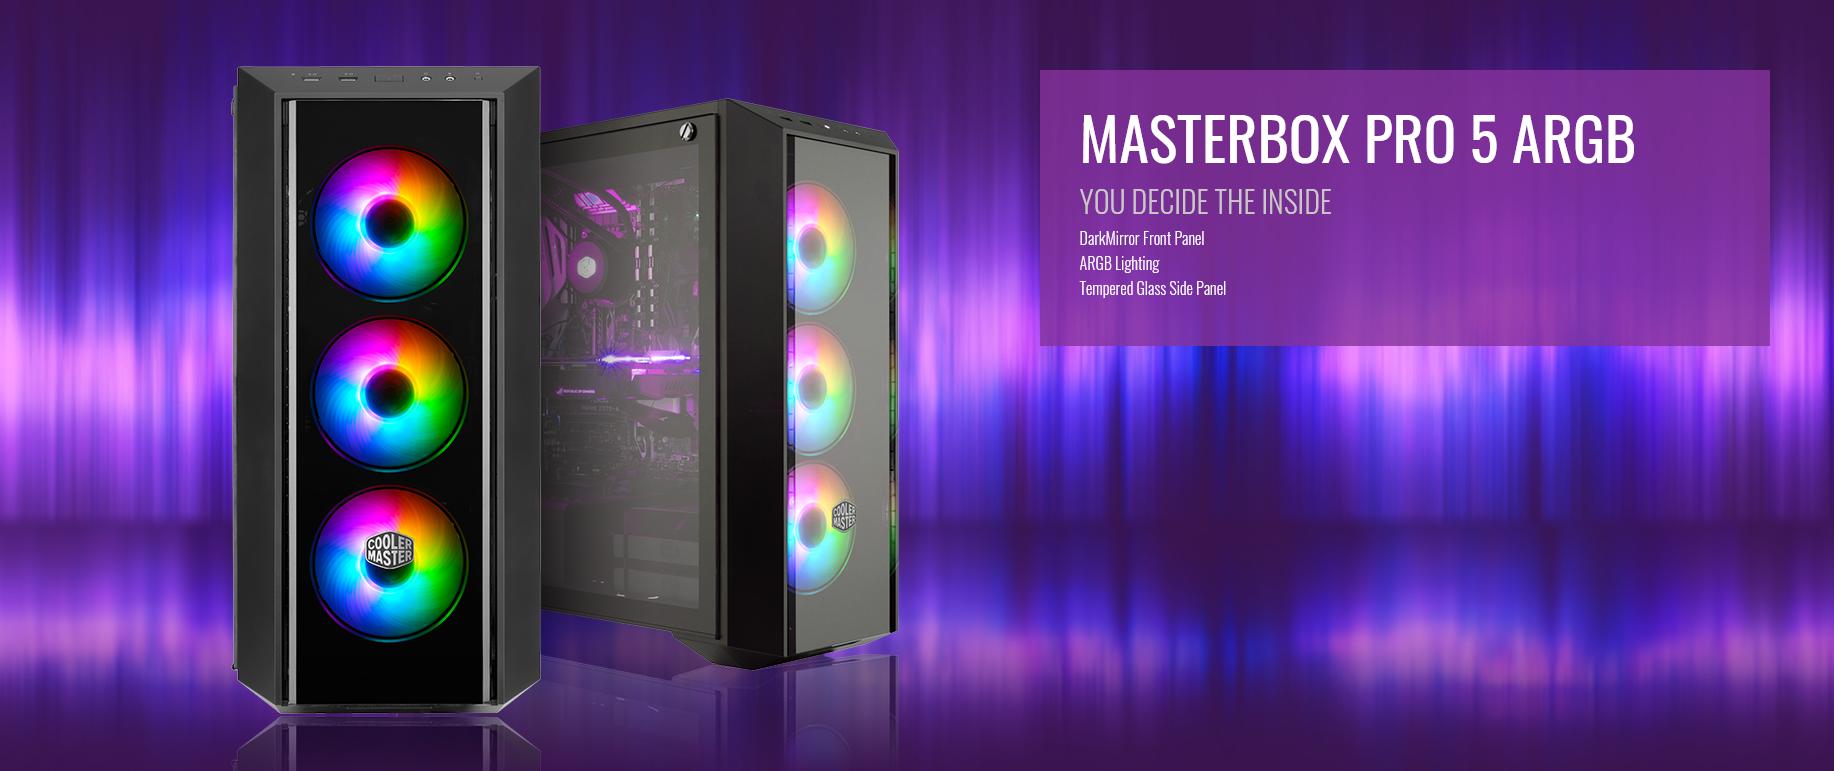 Case Cooler Master MasterBox Pro 5 ARGB giới thiệu